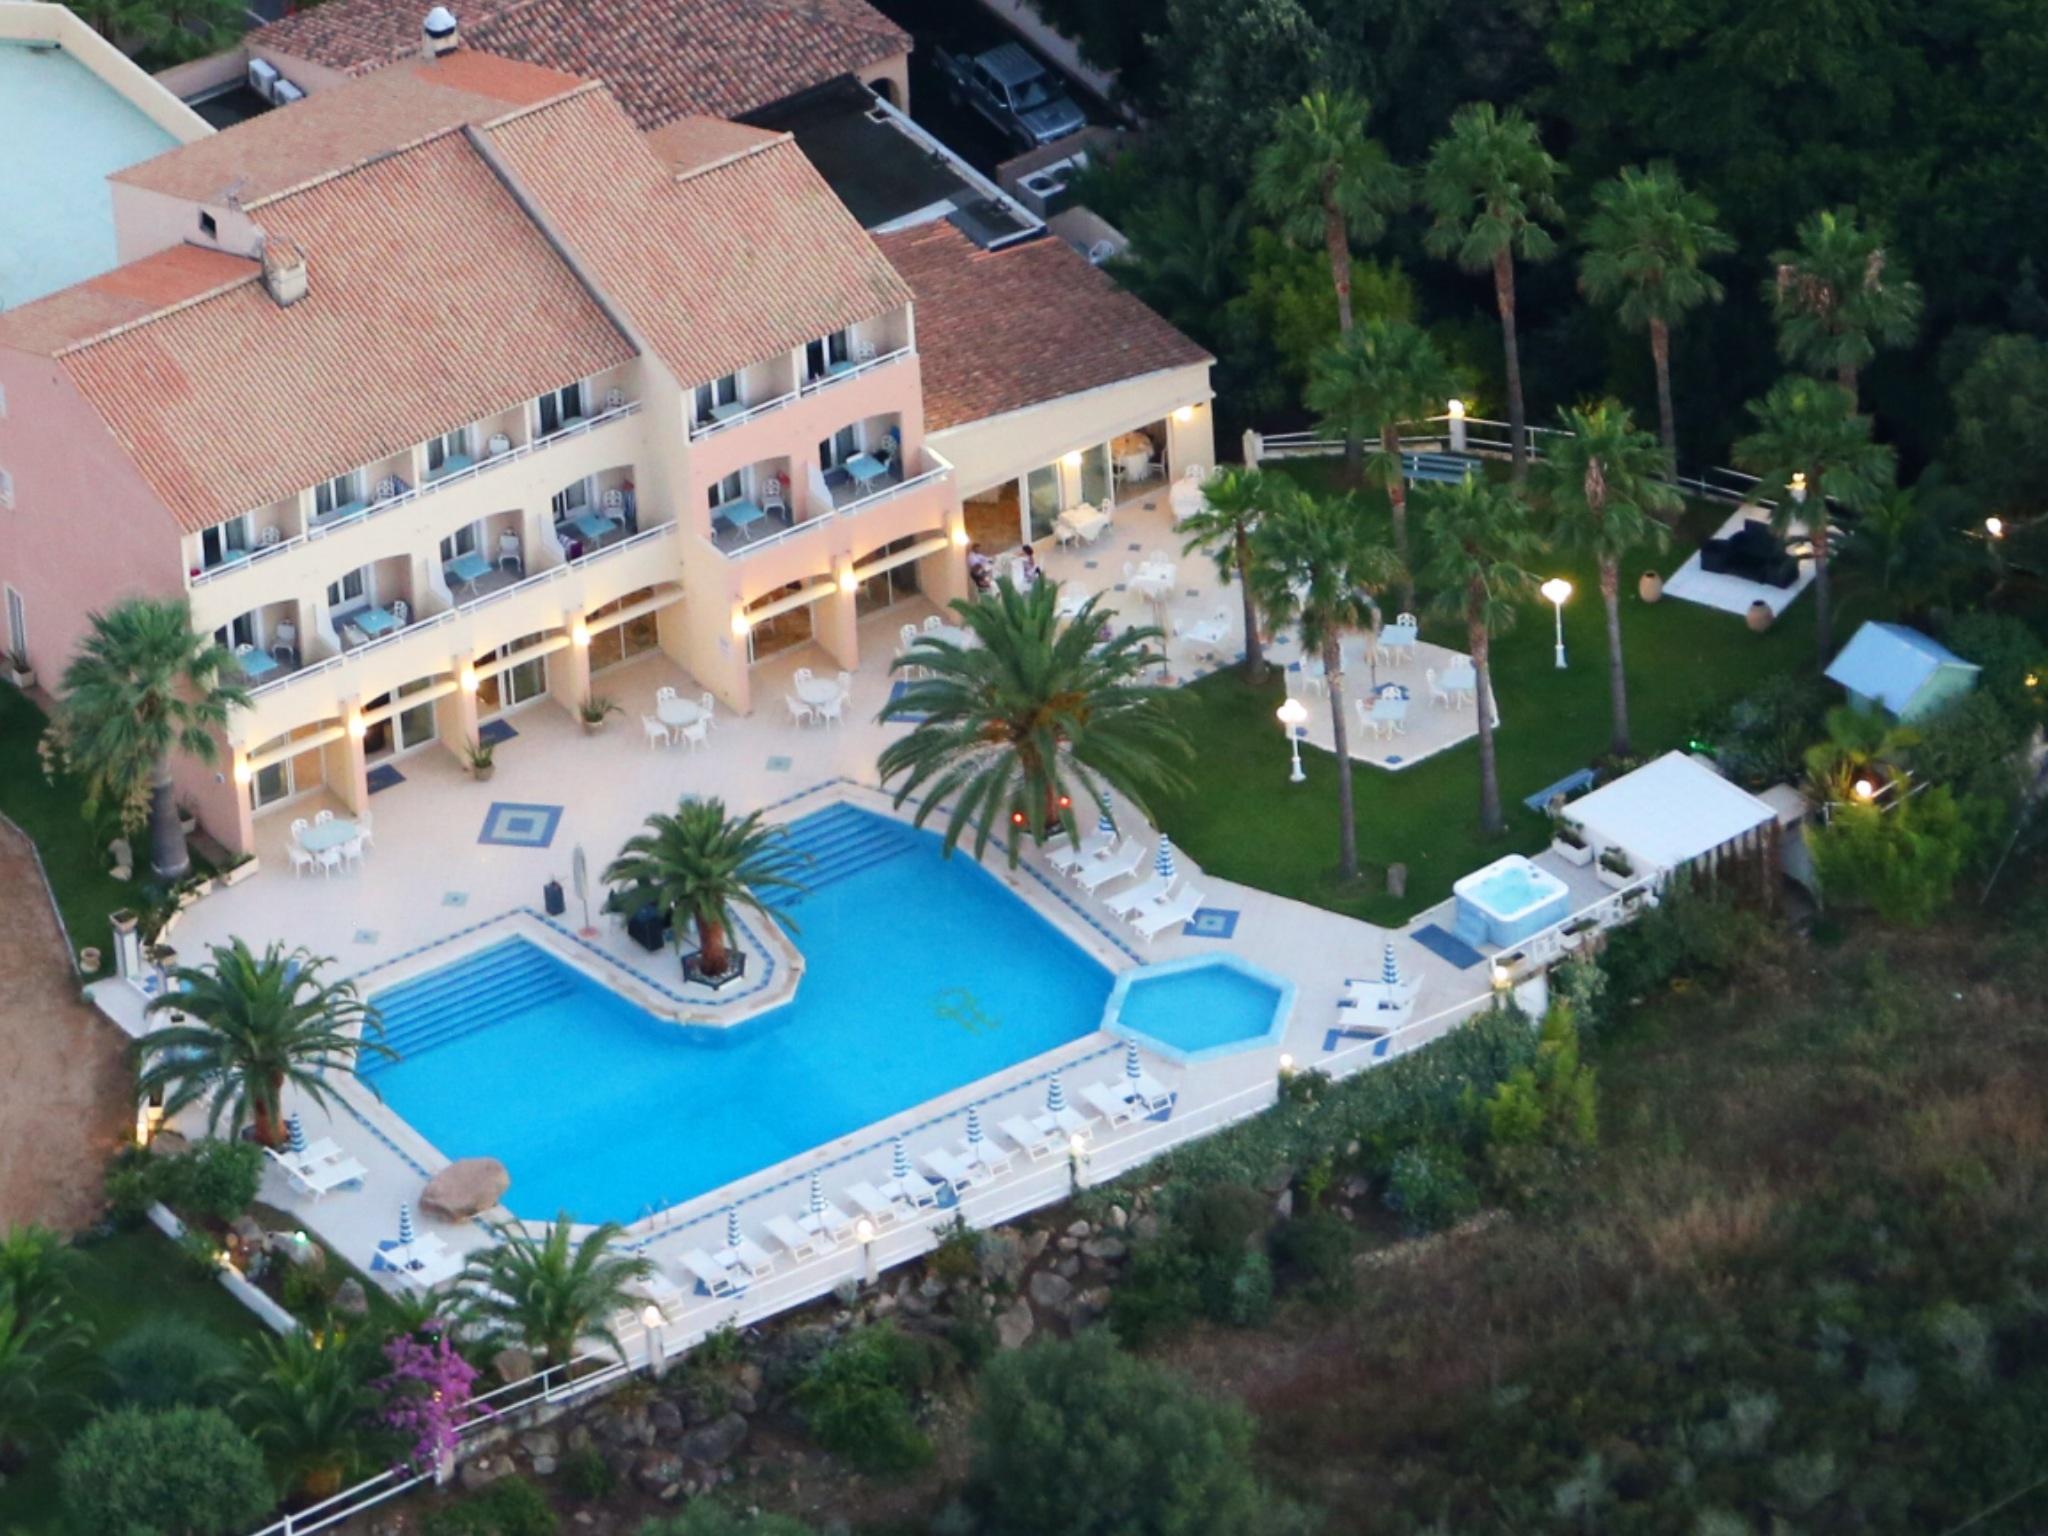 BEST WESTERN Hôtel Corsica